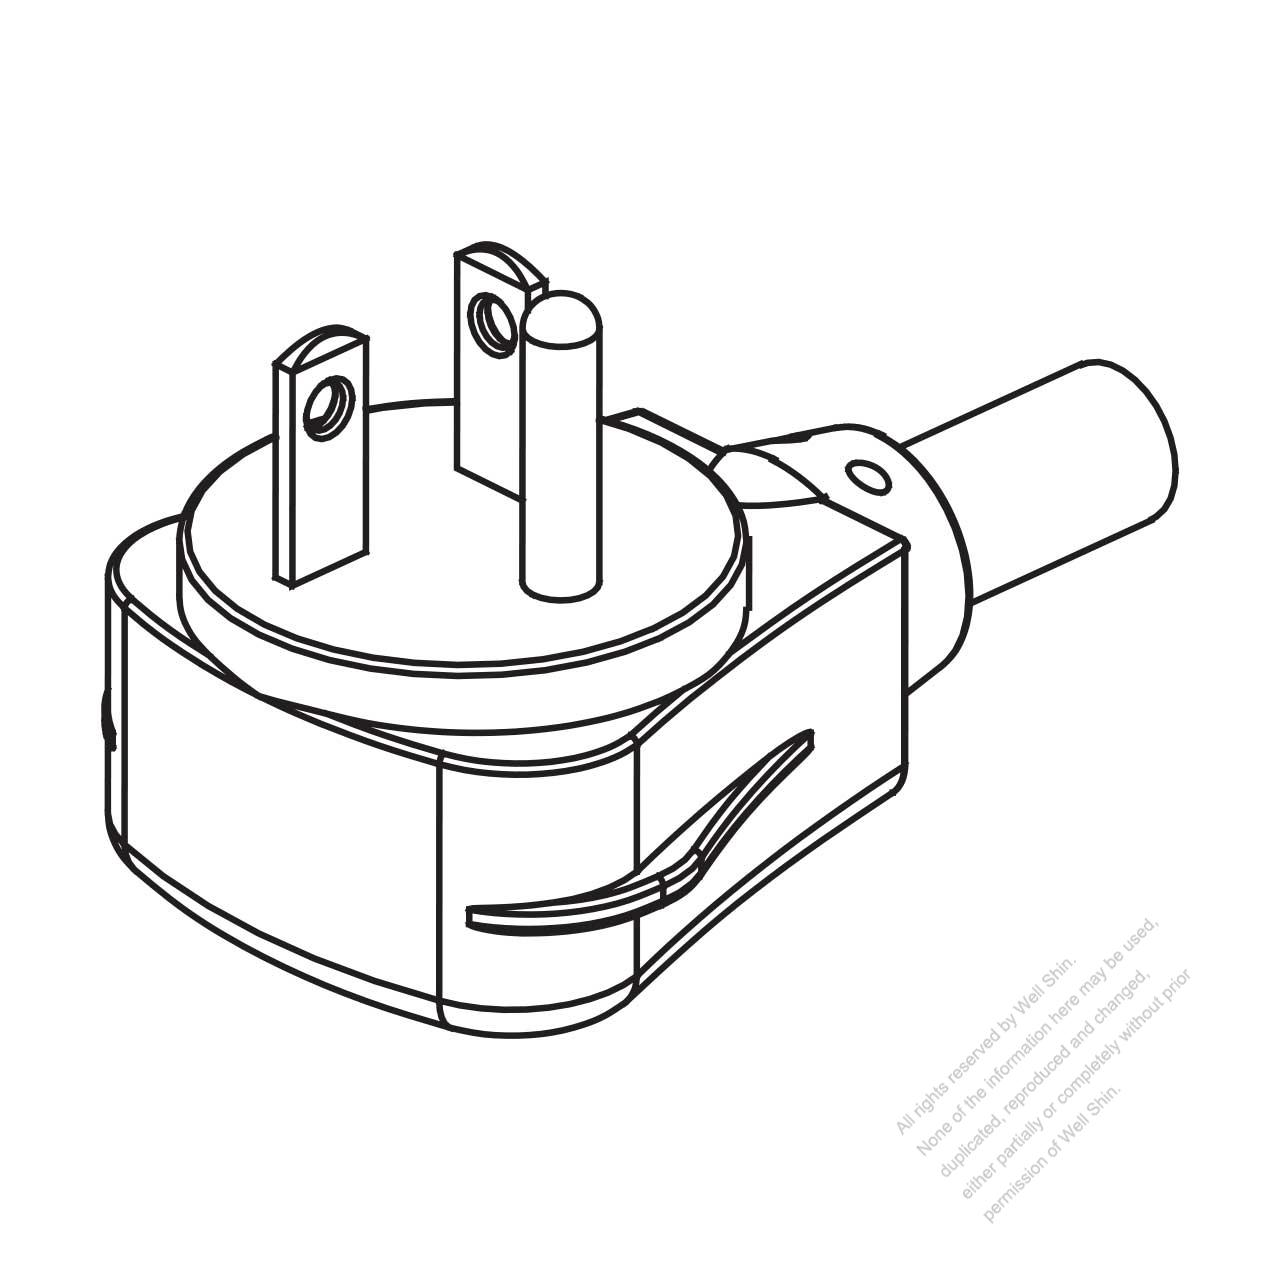 hight resolution of three phase nema l15 20r receptacle wiring diagram nema l15 30 3 phase wiring diagram